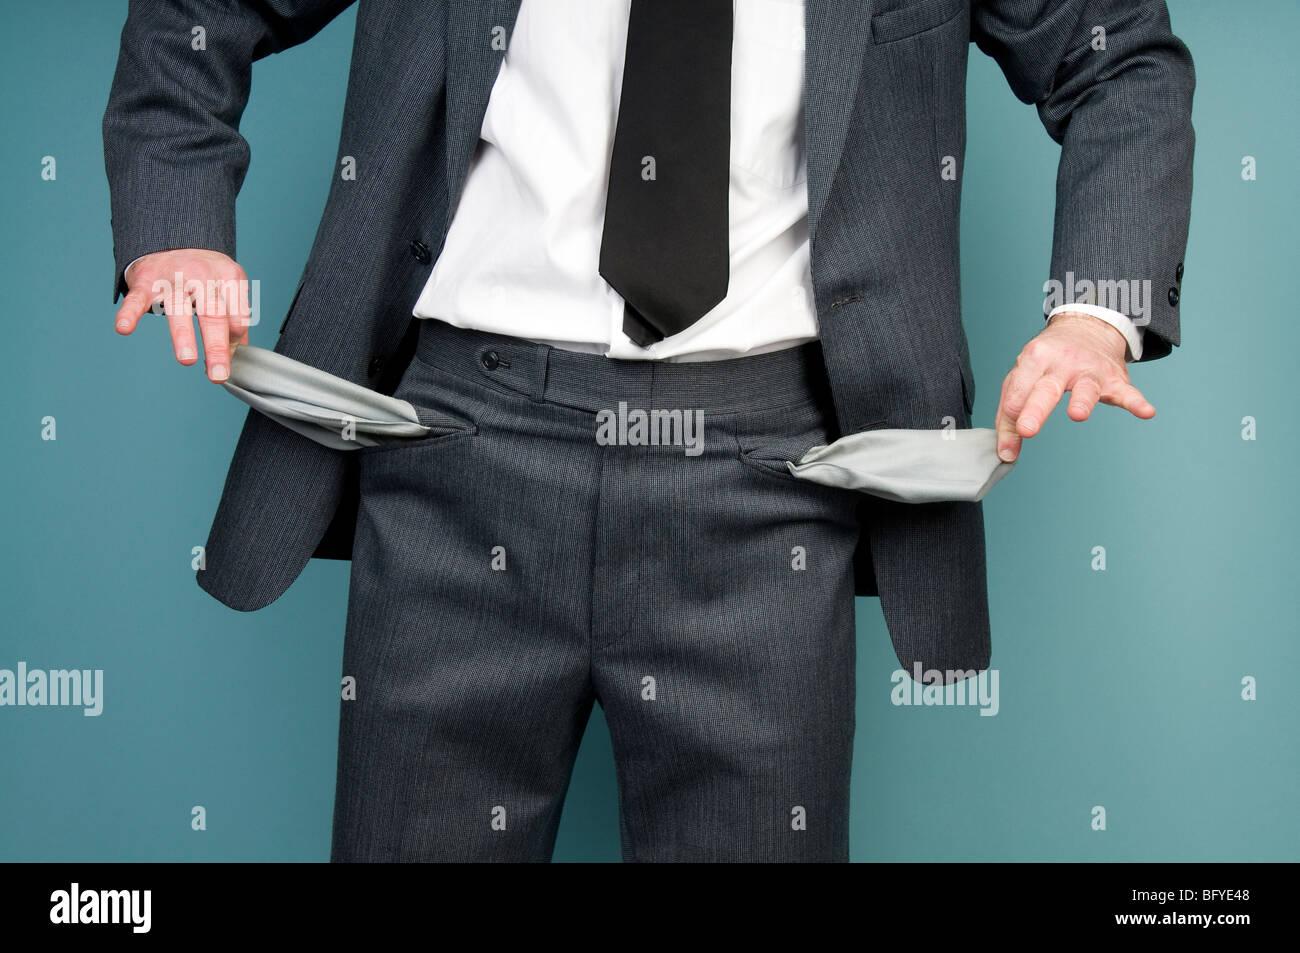 Businessman holding empty pockets - Stock Image